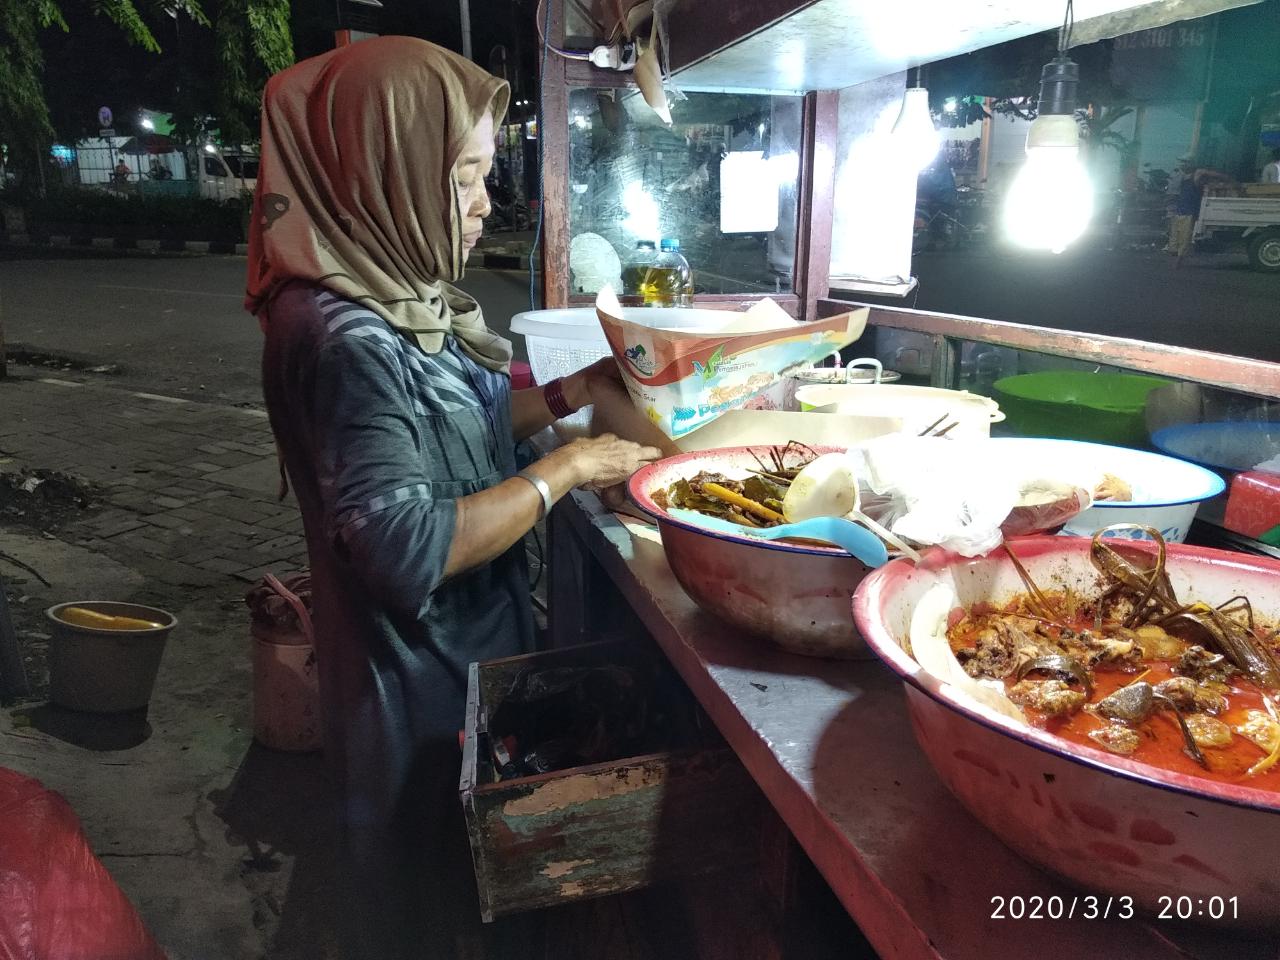 [COC Regional: Makanan Tradisional] Nasi Krawu Gresik Makanan Khas yang Melegenda